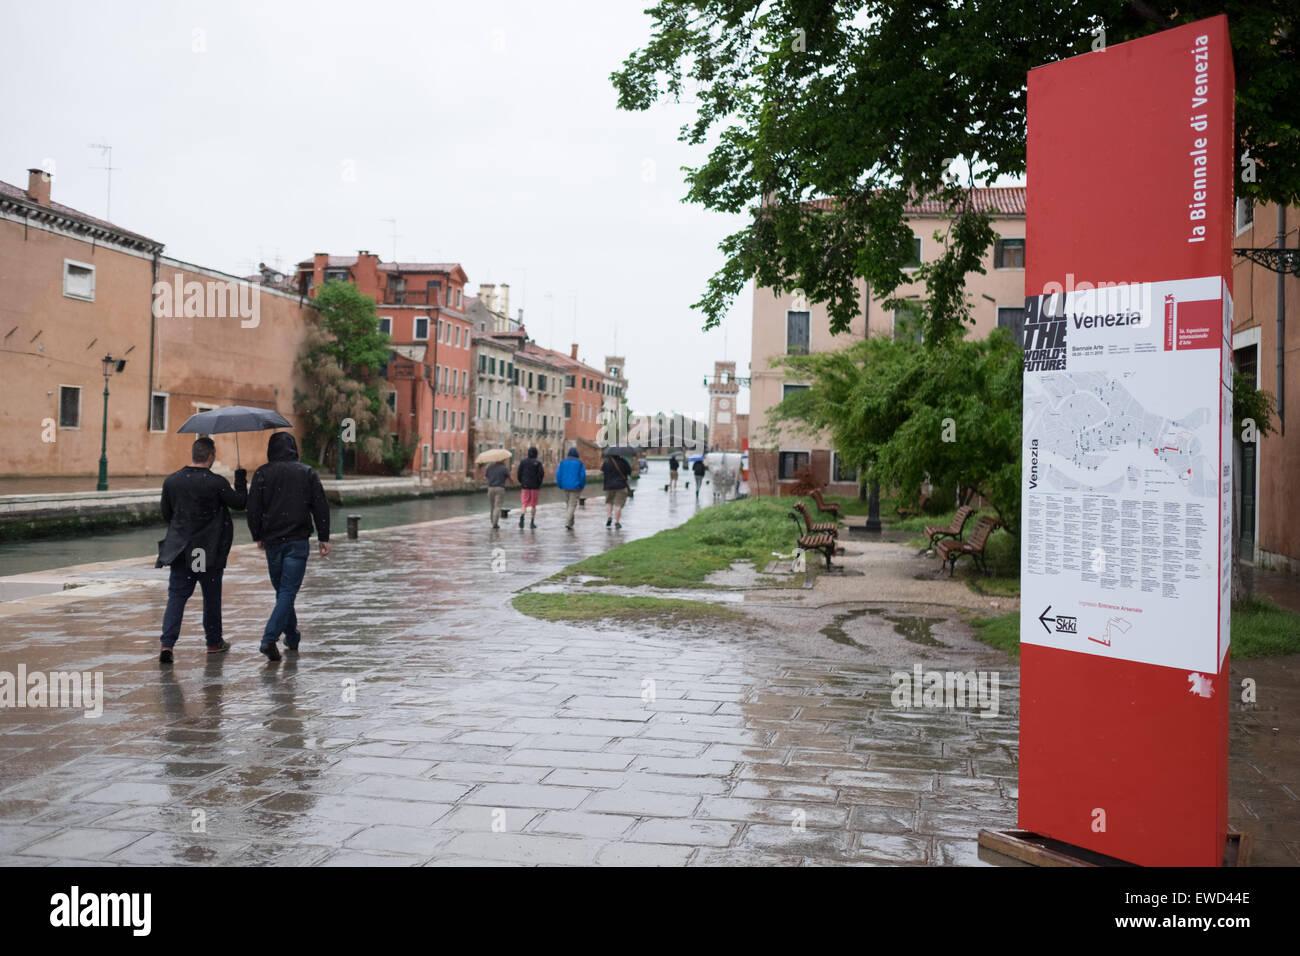 2015 Venice Biennale. Entrance sign. - Stock Image